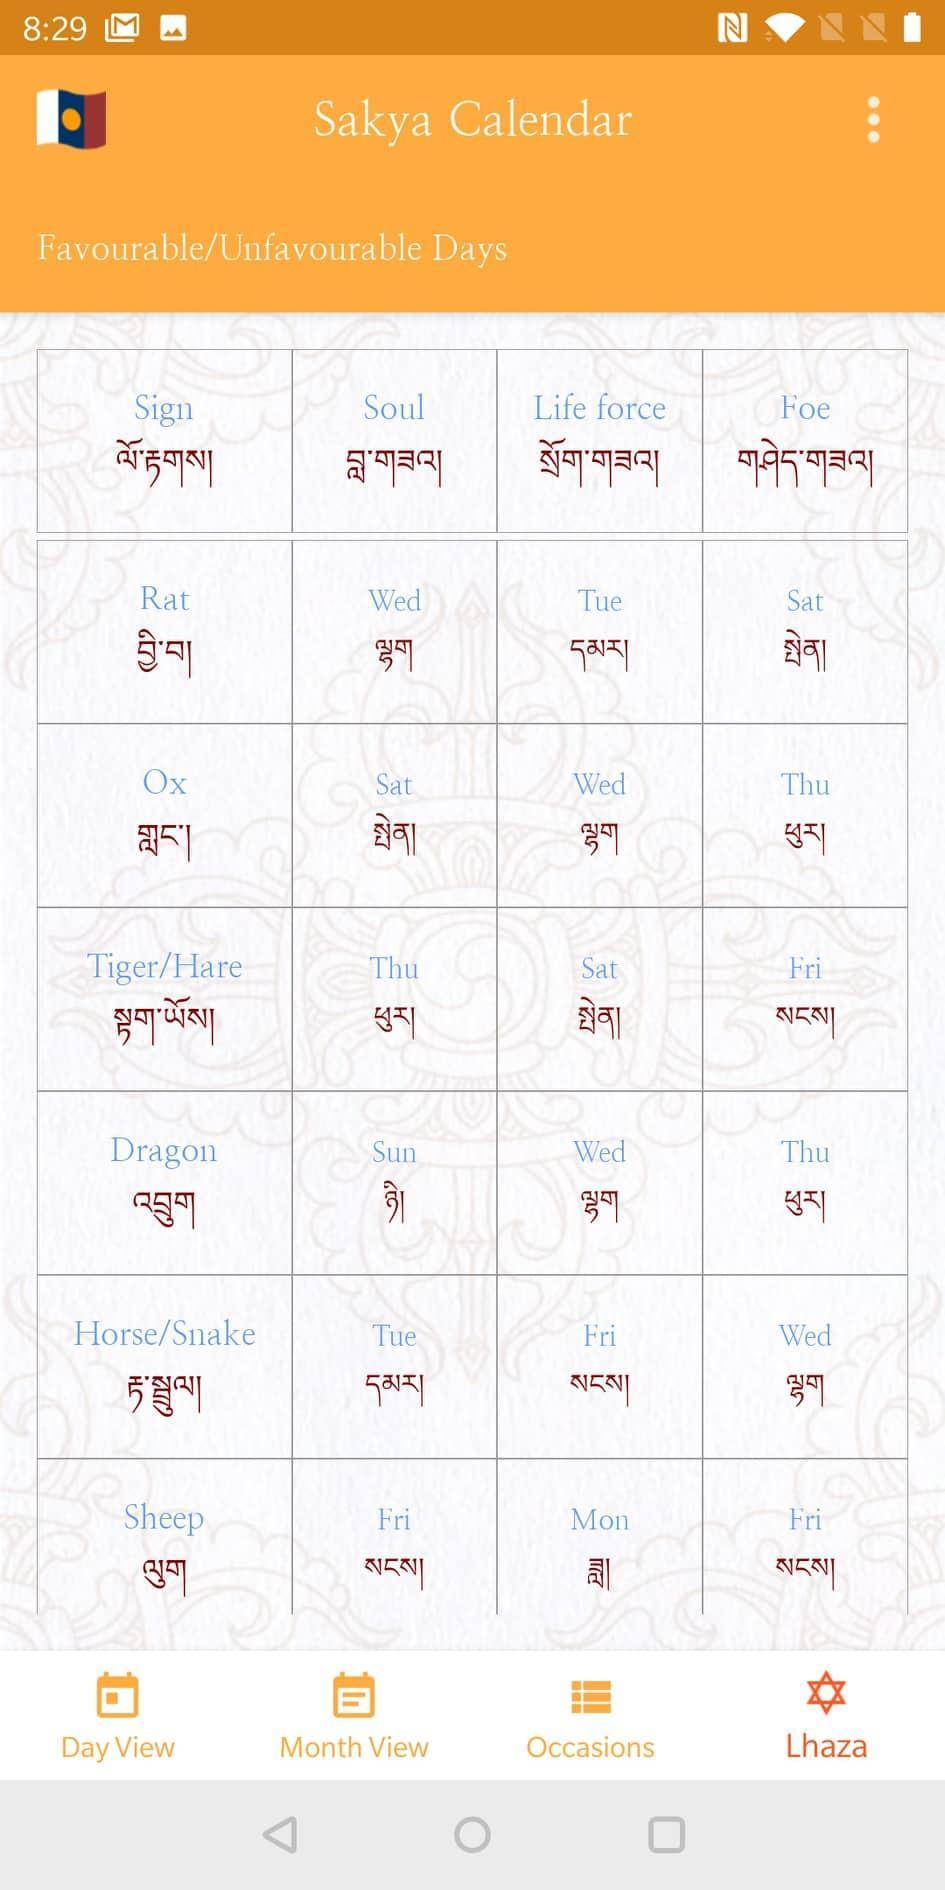 Sakya Calendar for Android - APK Download